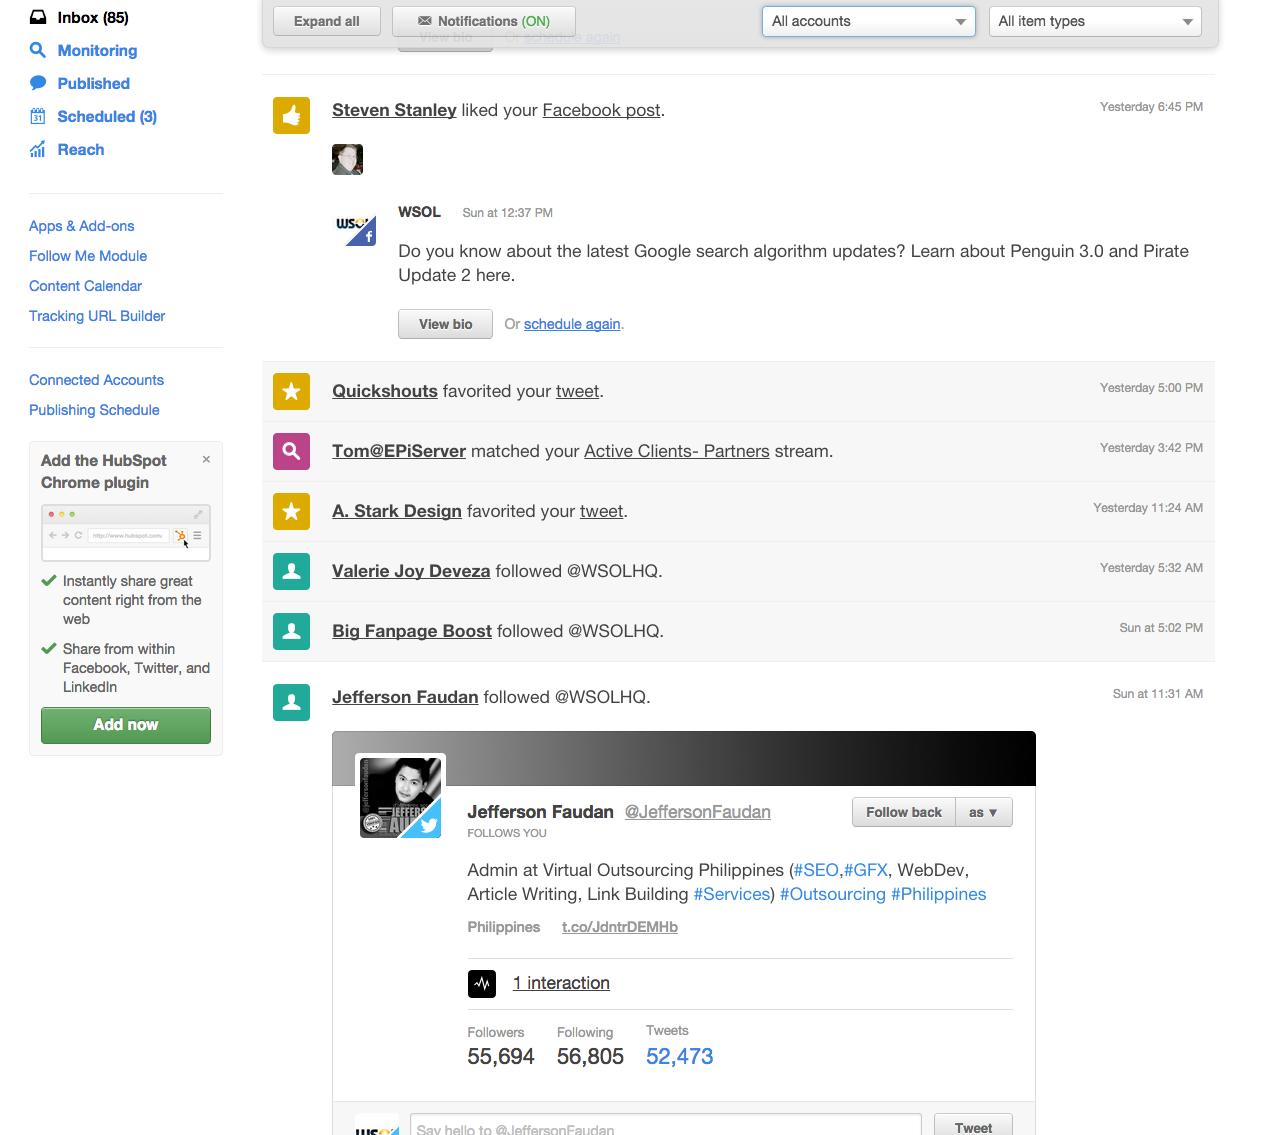 Social Inbox Color Codes